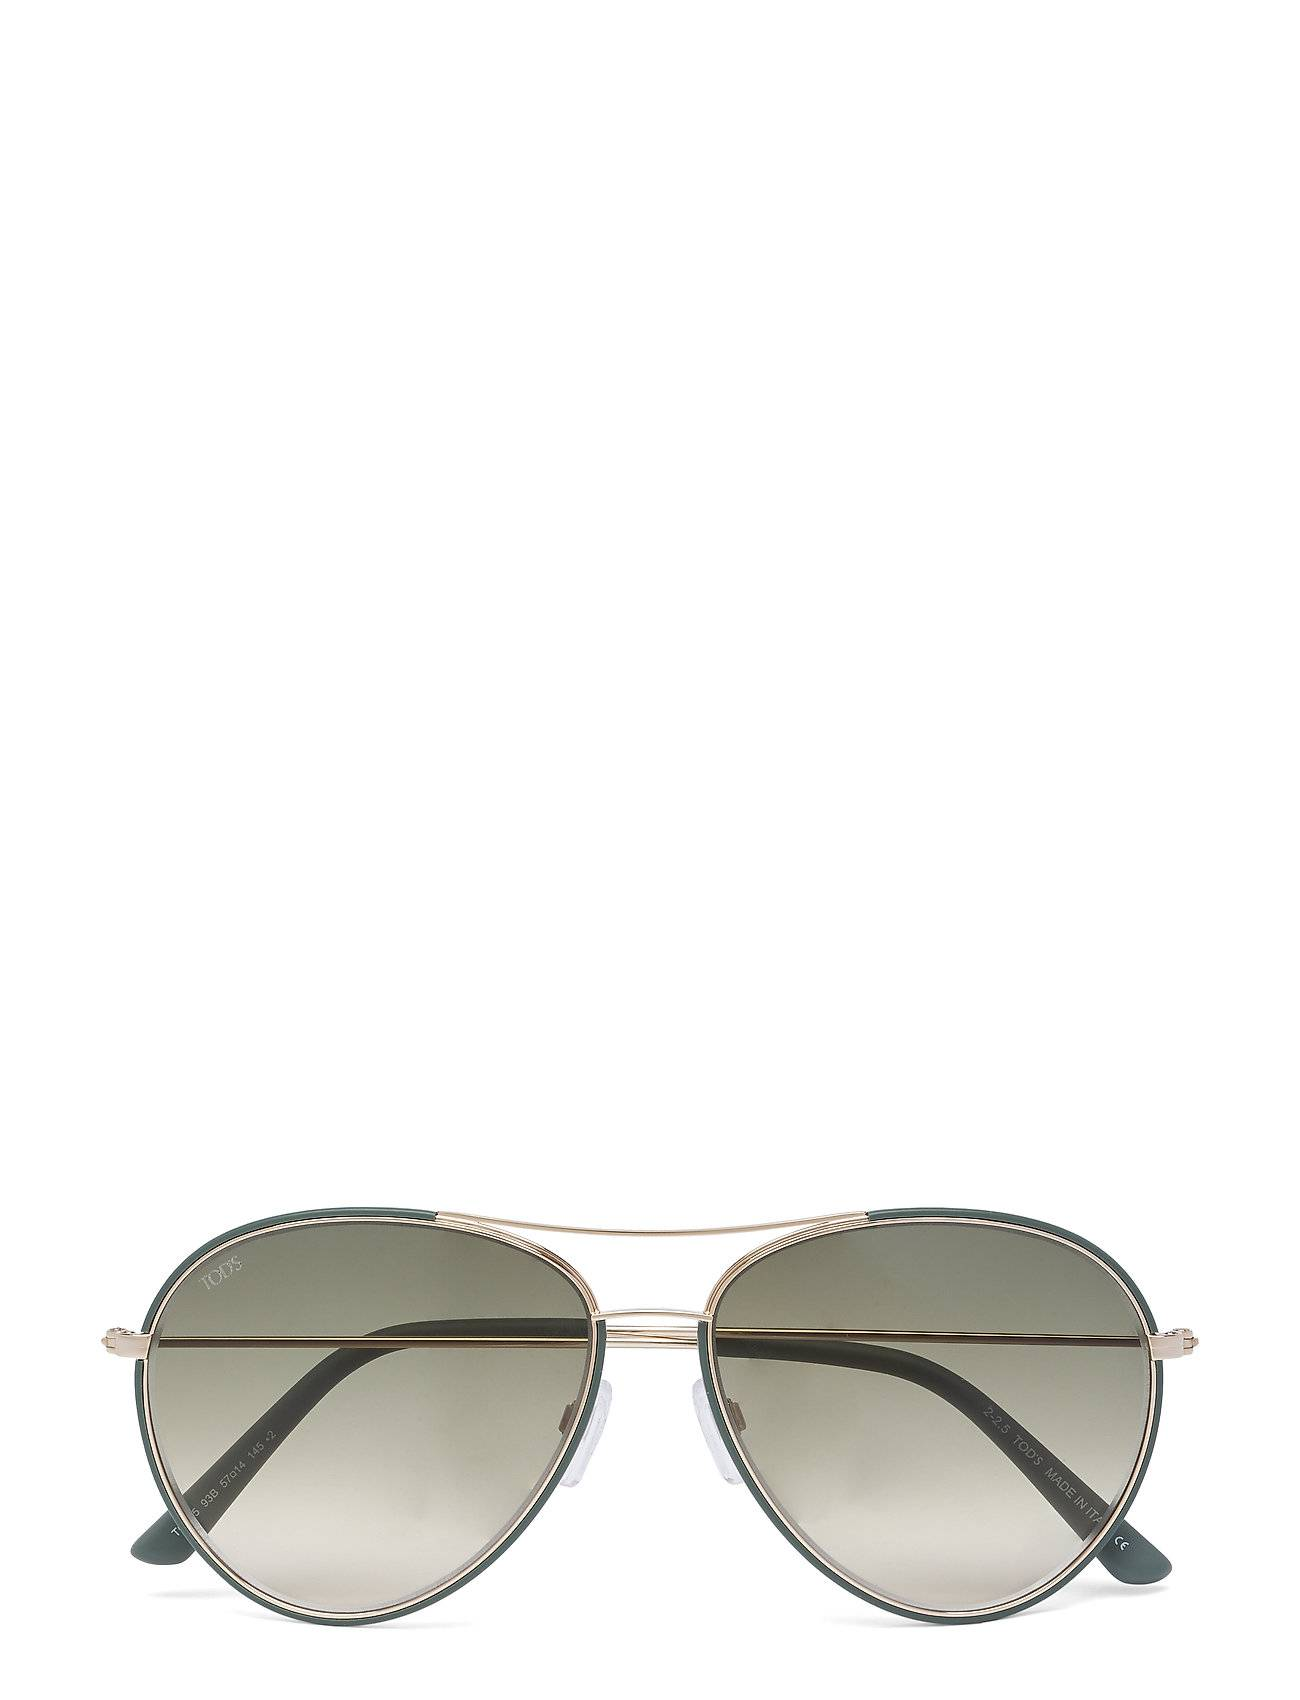 Image of TODS Sunglasses To0155 Pilottilasit Aurinkolasit Kulta TODS Sunglasses